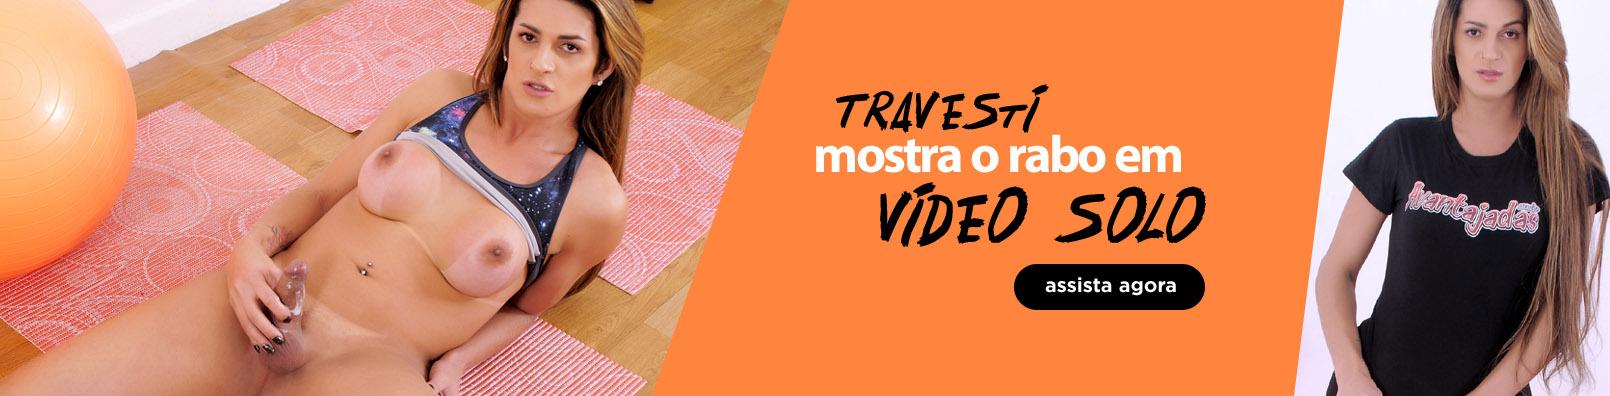 Travesti mostra o rabo em vídeo solo